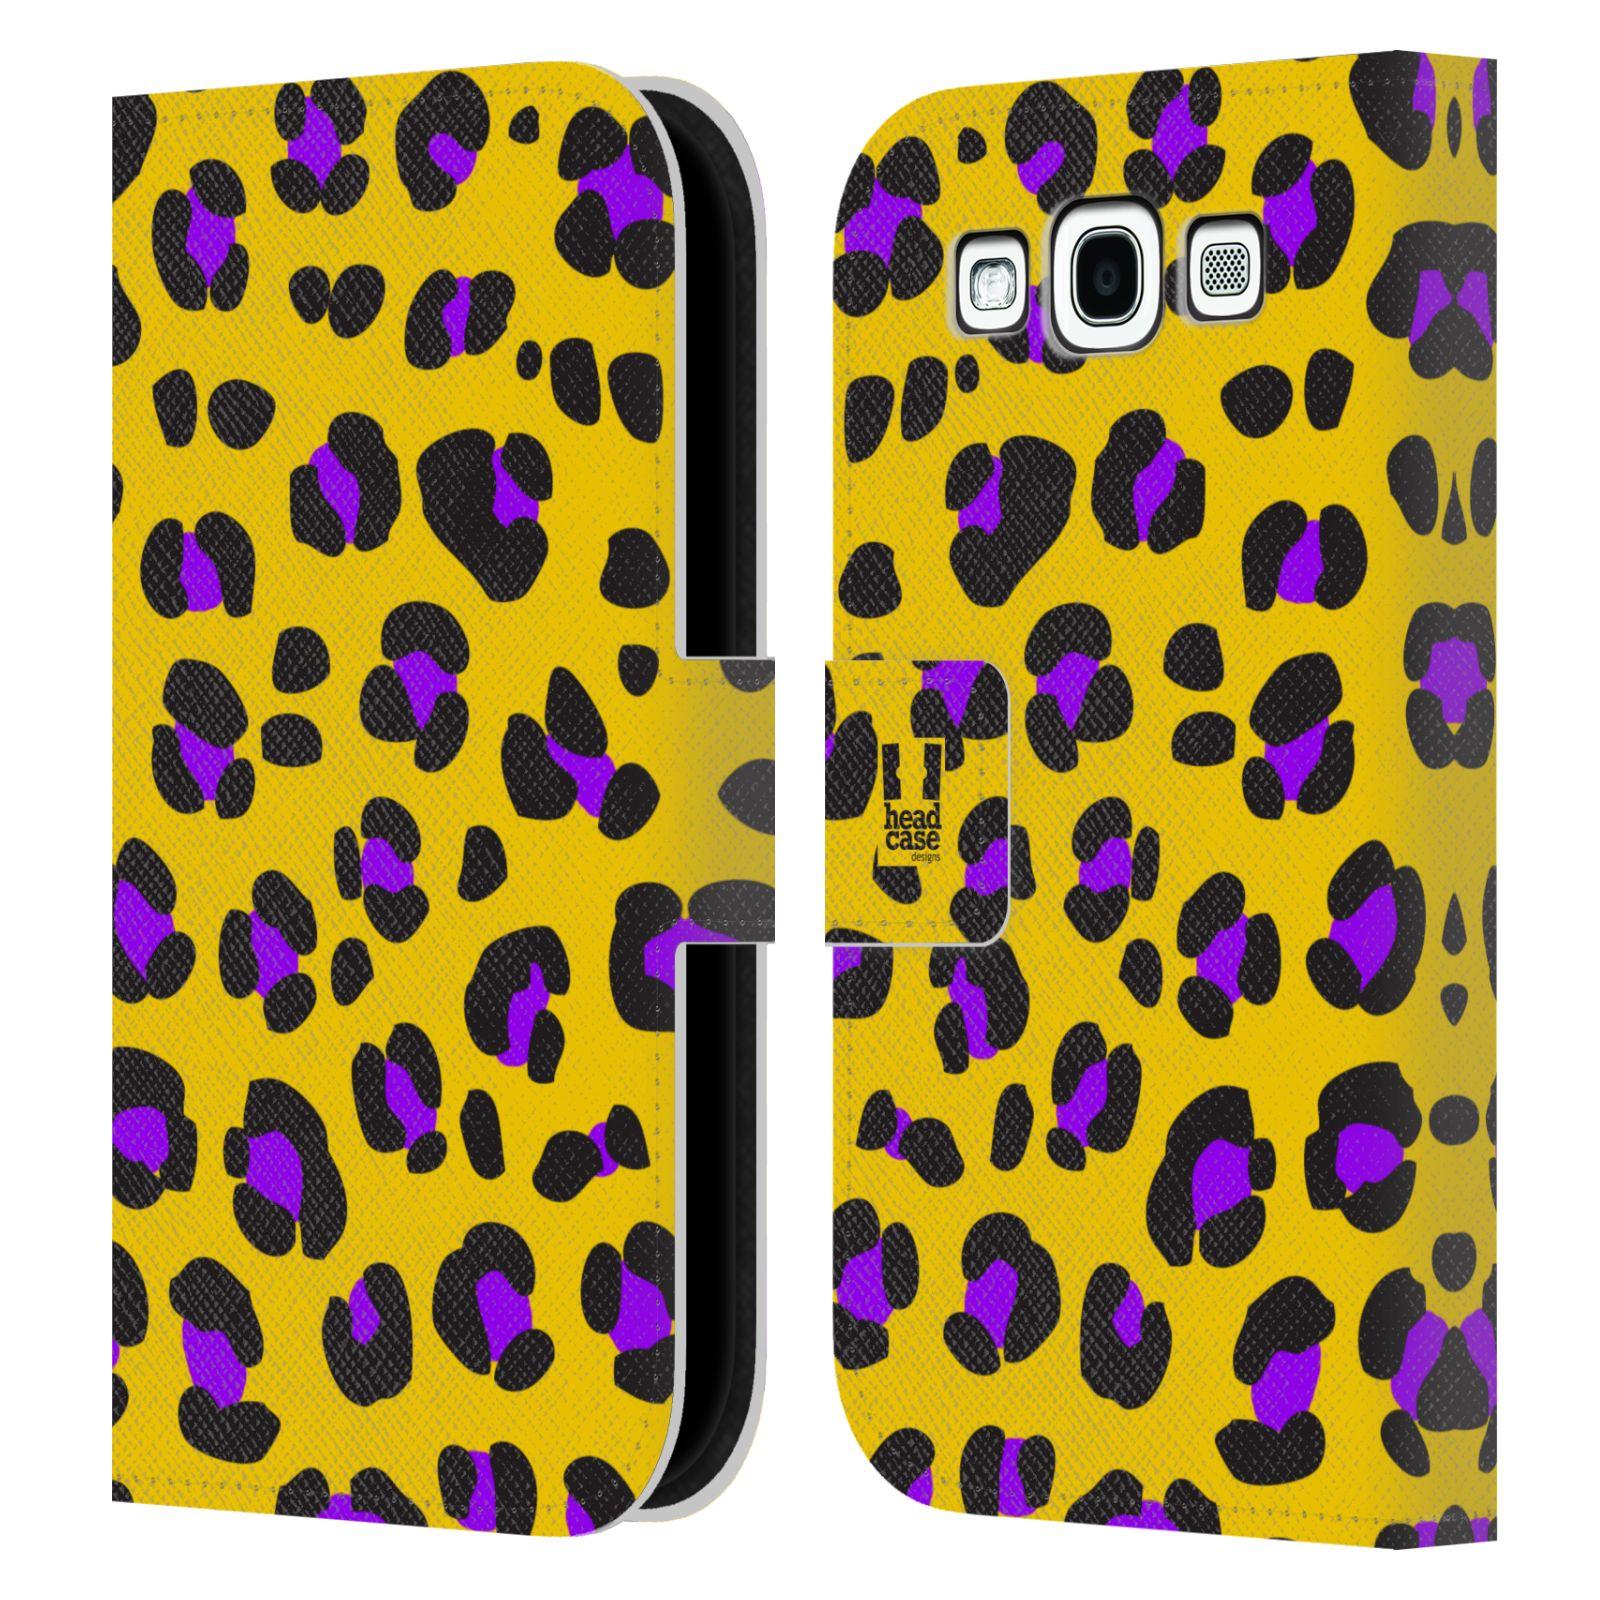 HEAD CASE Flipové pouzdro pro mobil Samsung Galaxy S3 Zvířecí barevné vzory žlutý leopard fialové skvrny